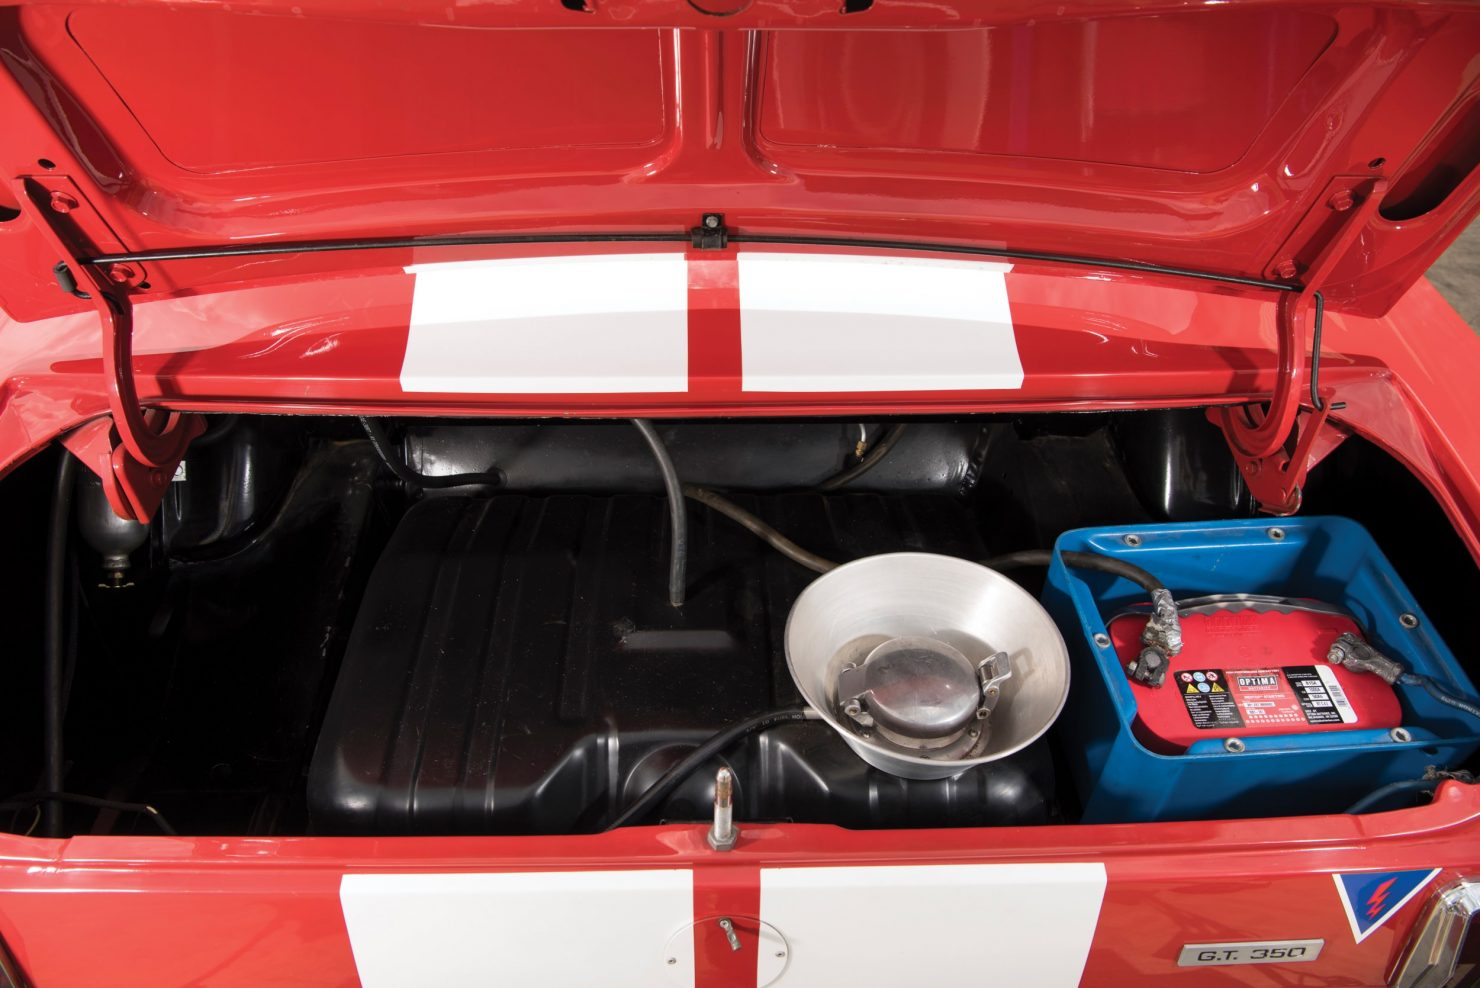 shelby gt350 race car 19 1480x988 - 1966 Shelby GT350 - Period SCCA Race Car